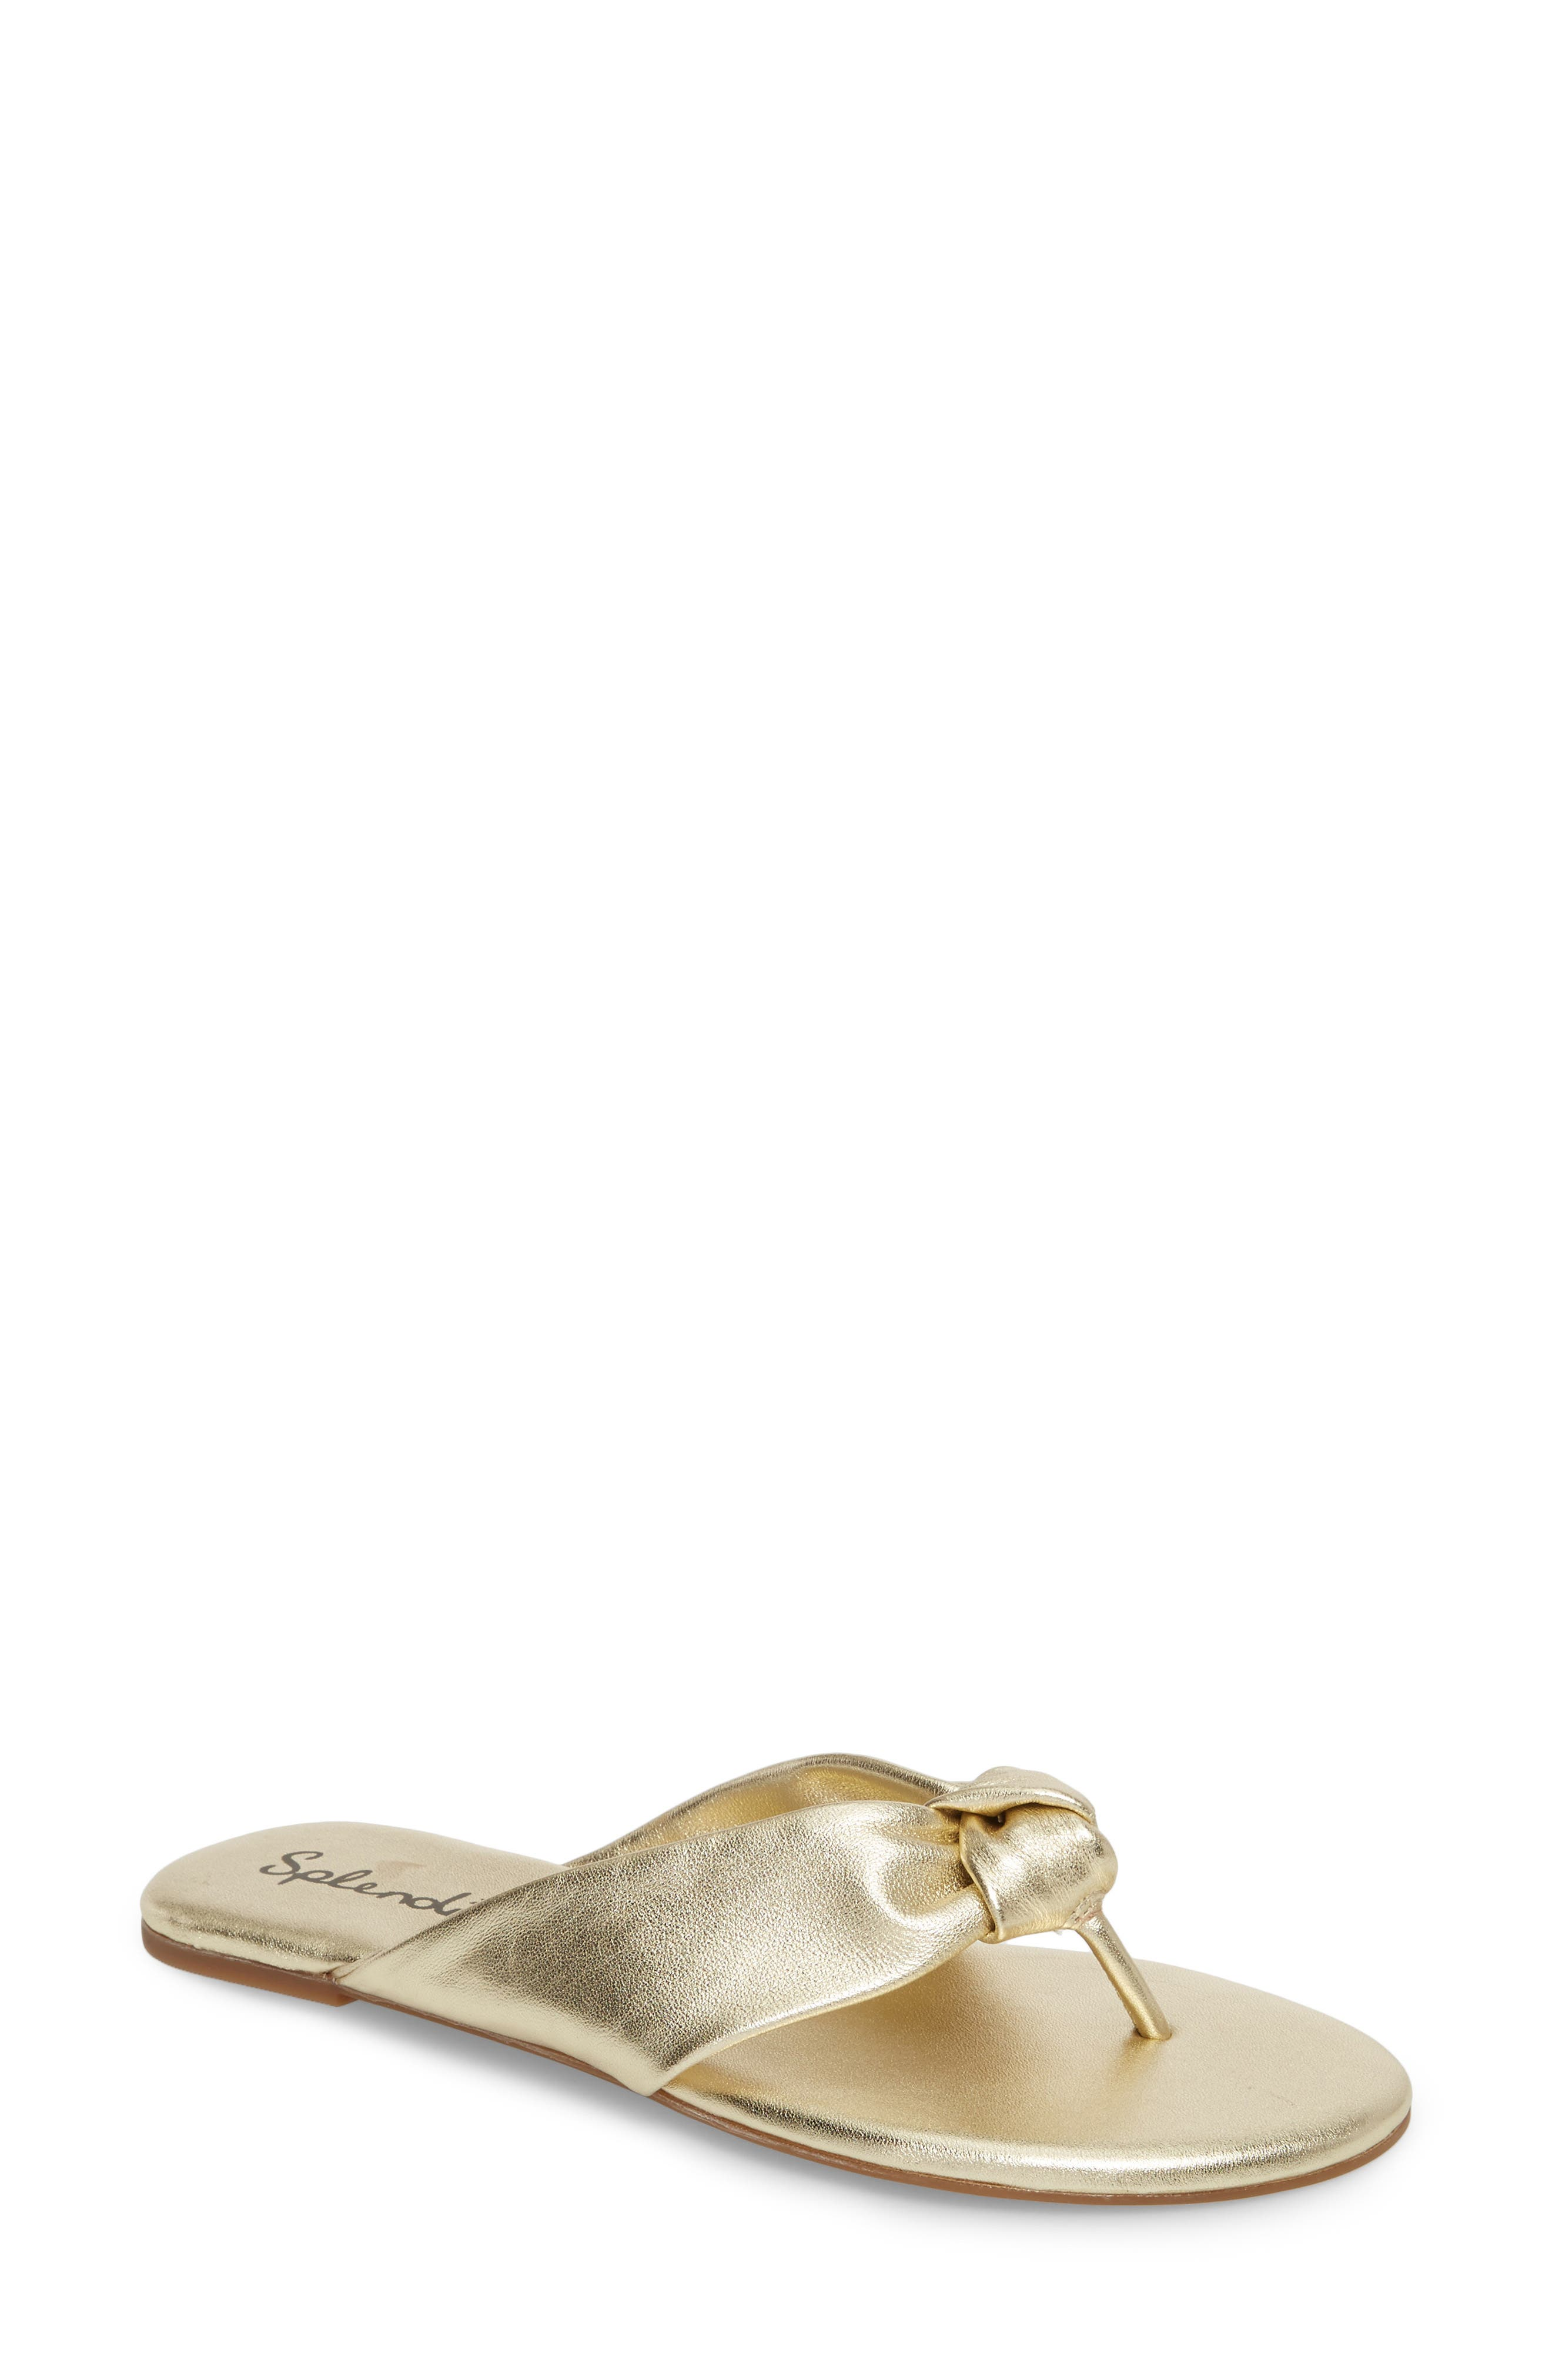 Main Image - Splendid Bridgette Knotted Flip Flop (Women)